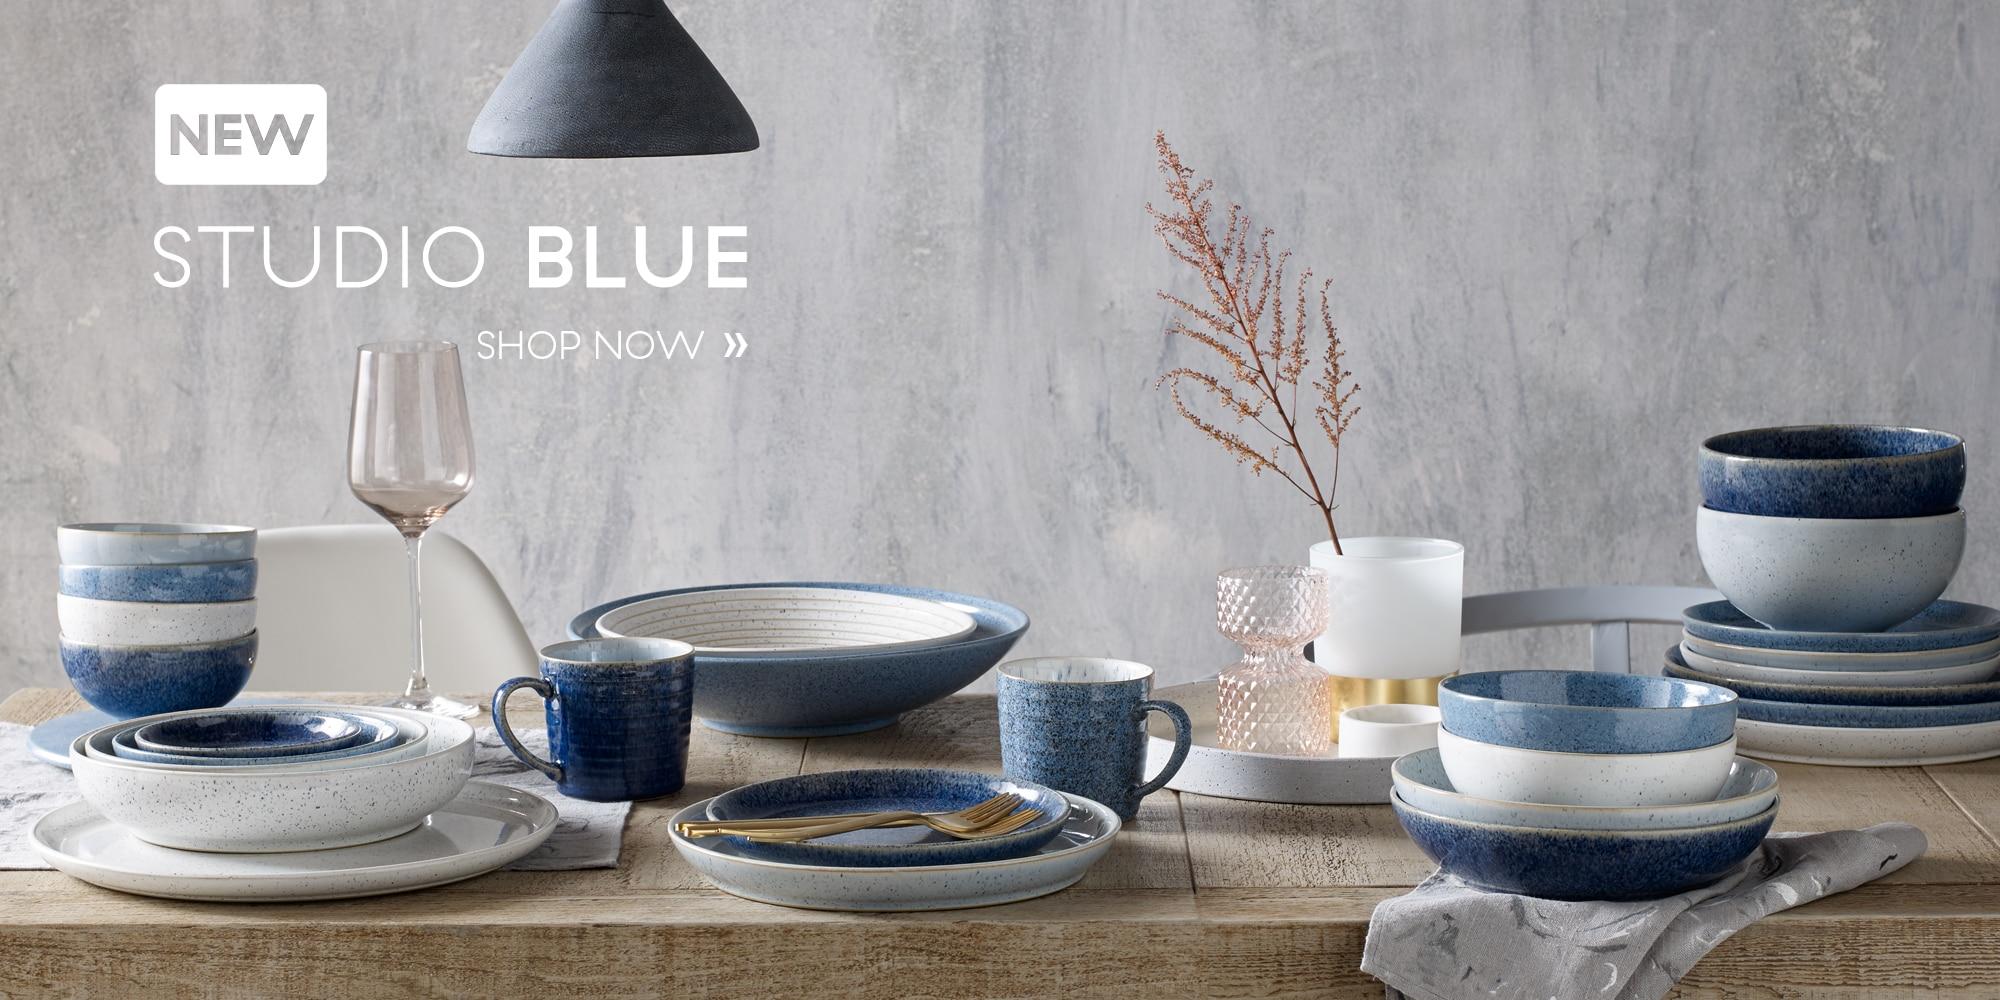 Shop Now & Denby Pottery | Dinner Sets Tableware Cookware \u0026 Glassware